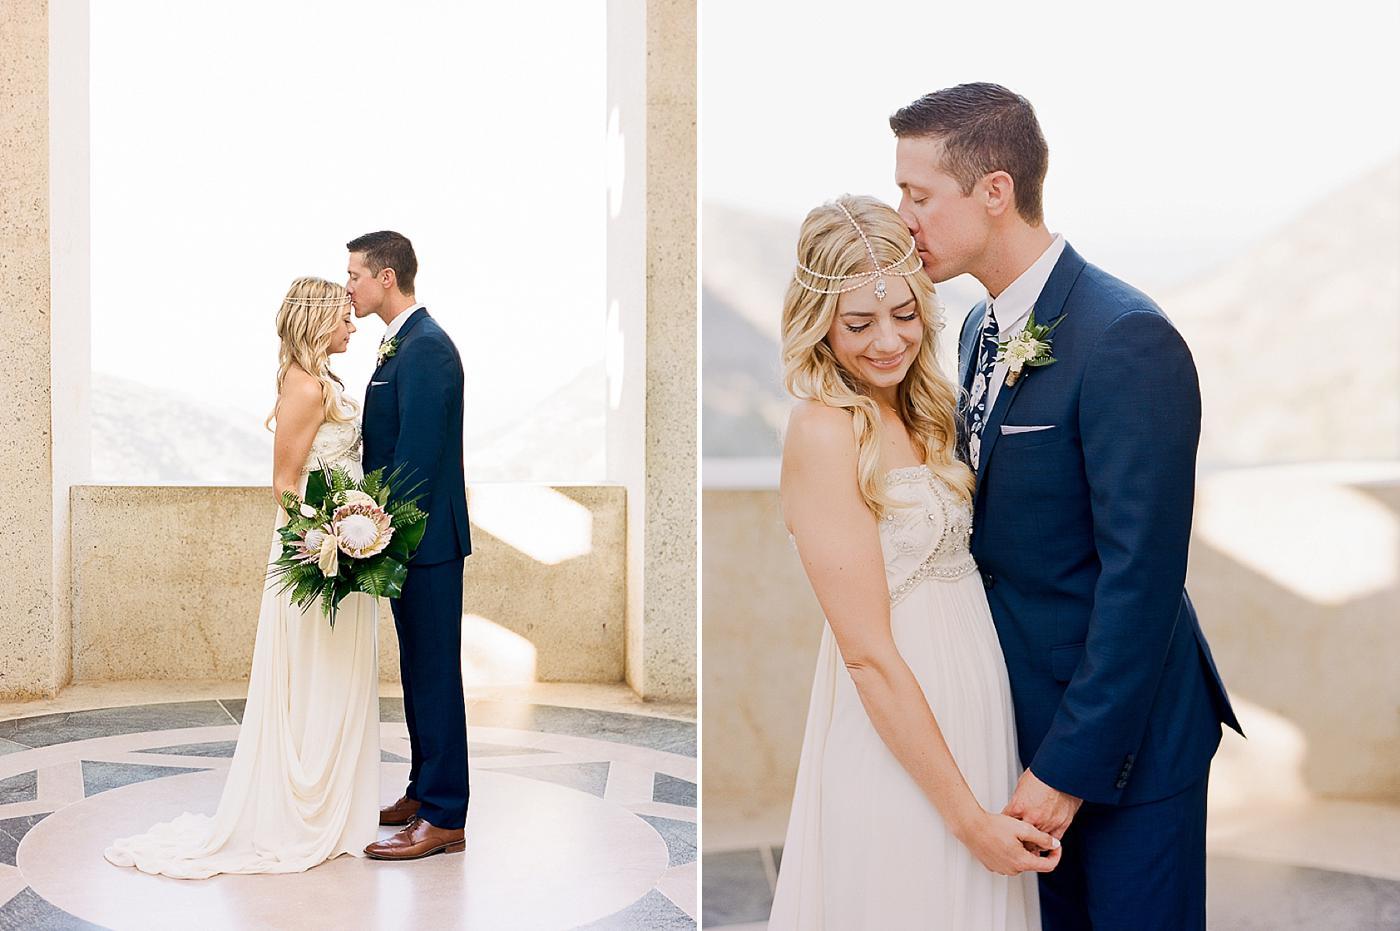 nashville-wedding-photographer-greg-ross_0191